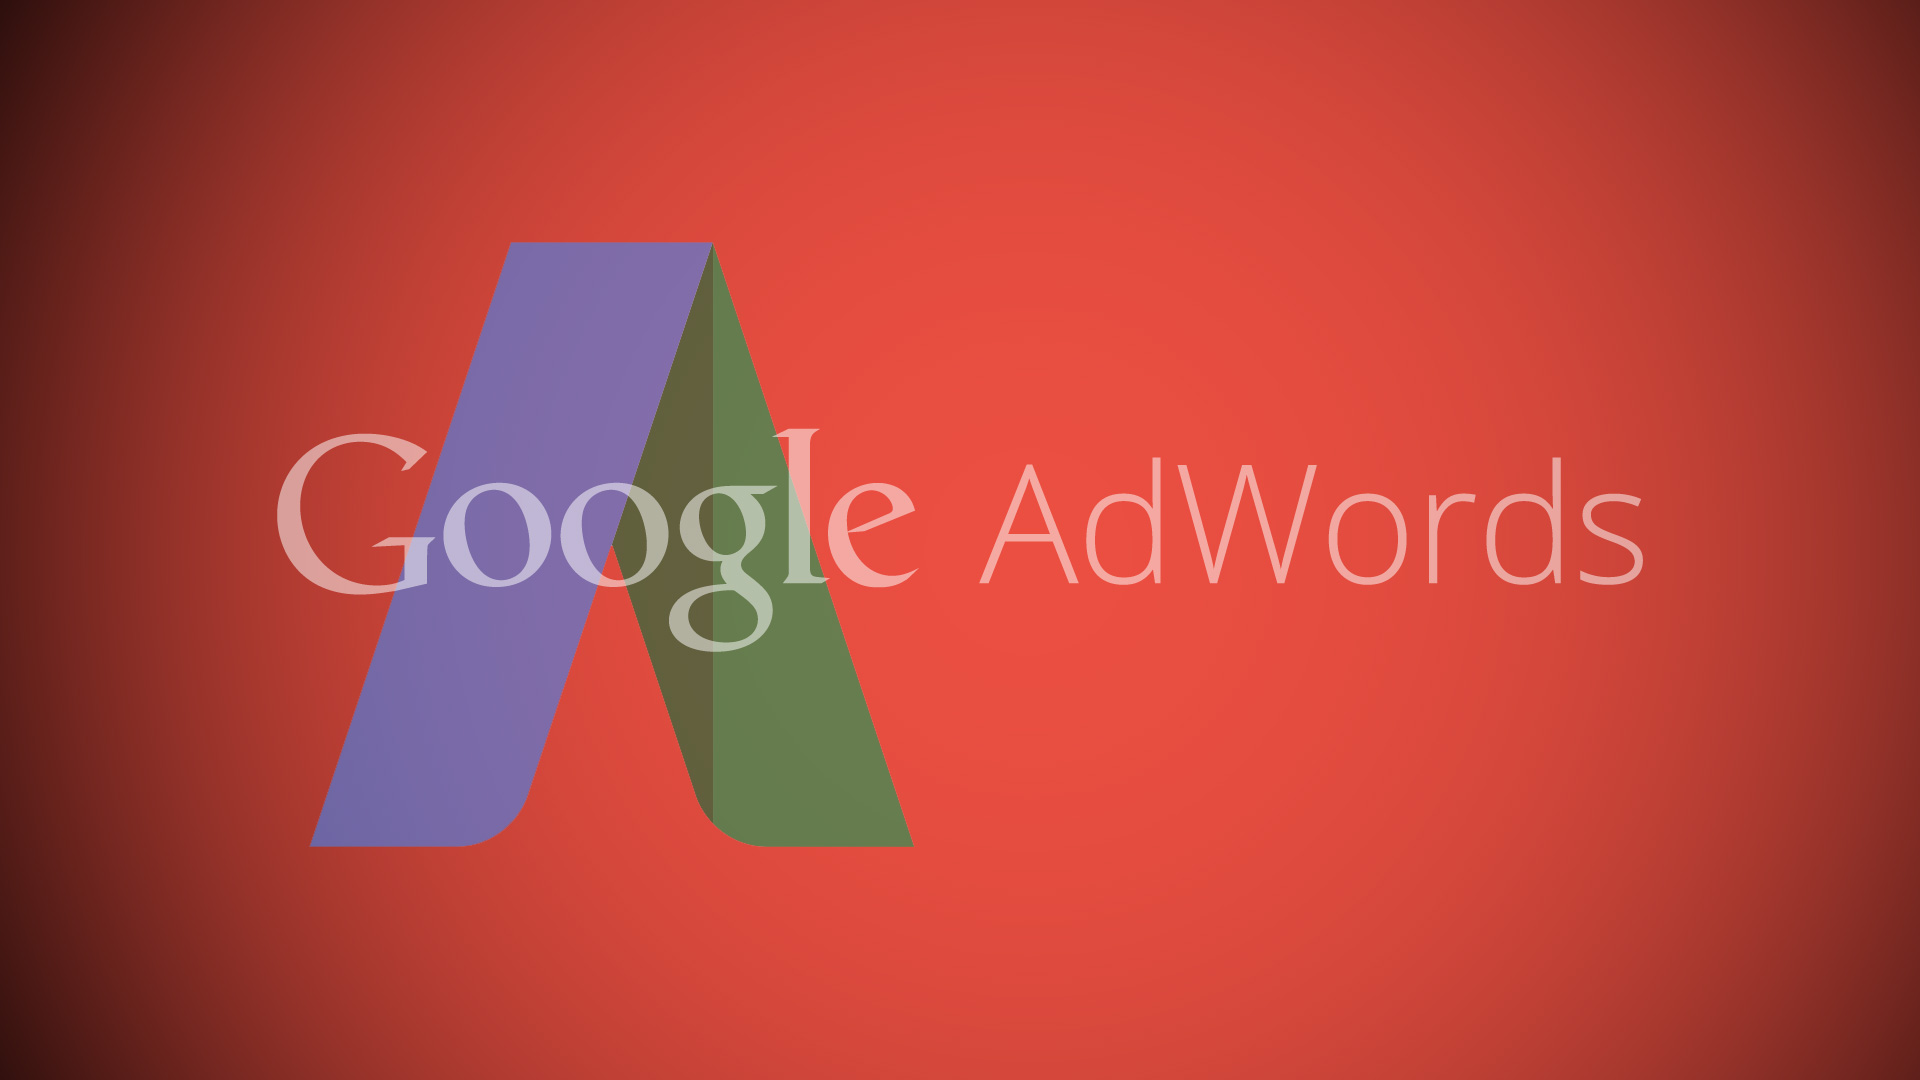 Google Adwords Keyword Research Tools   Source